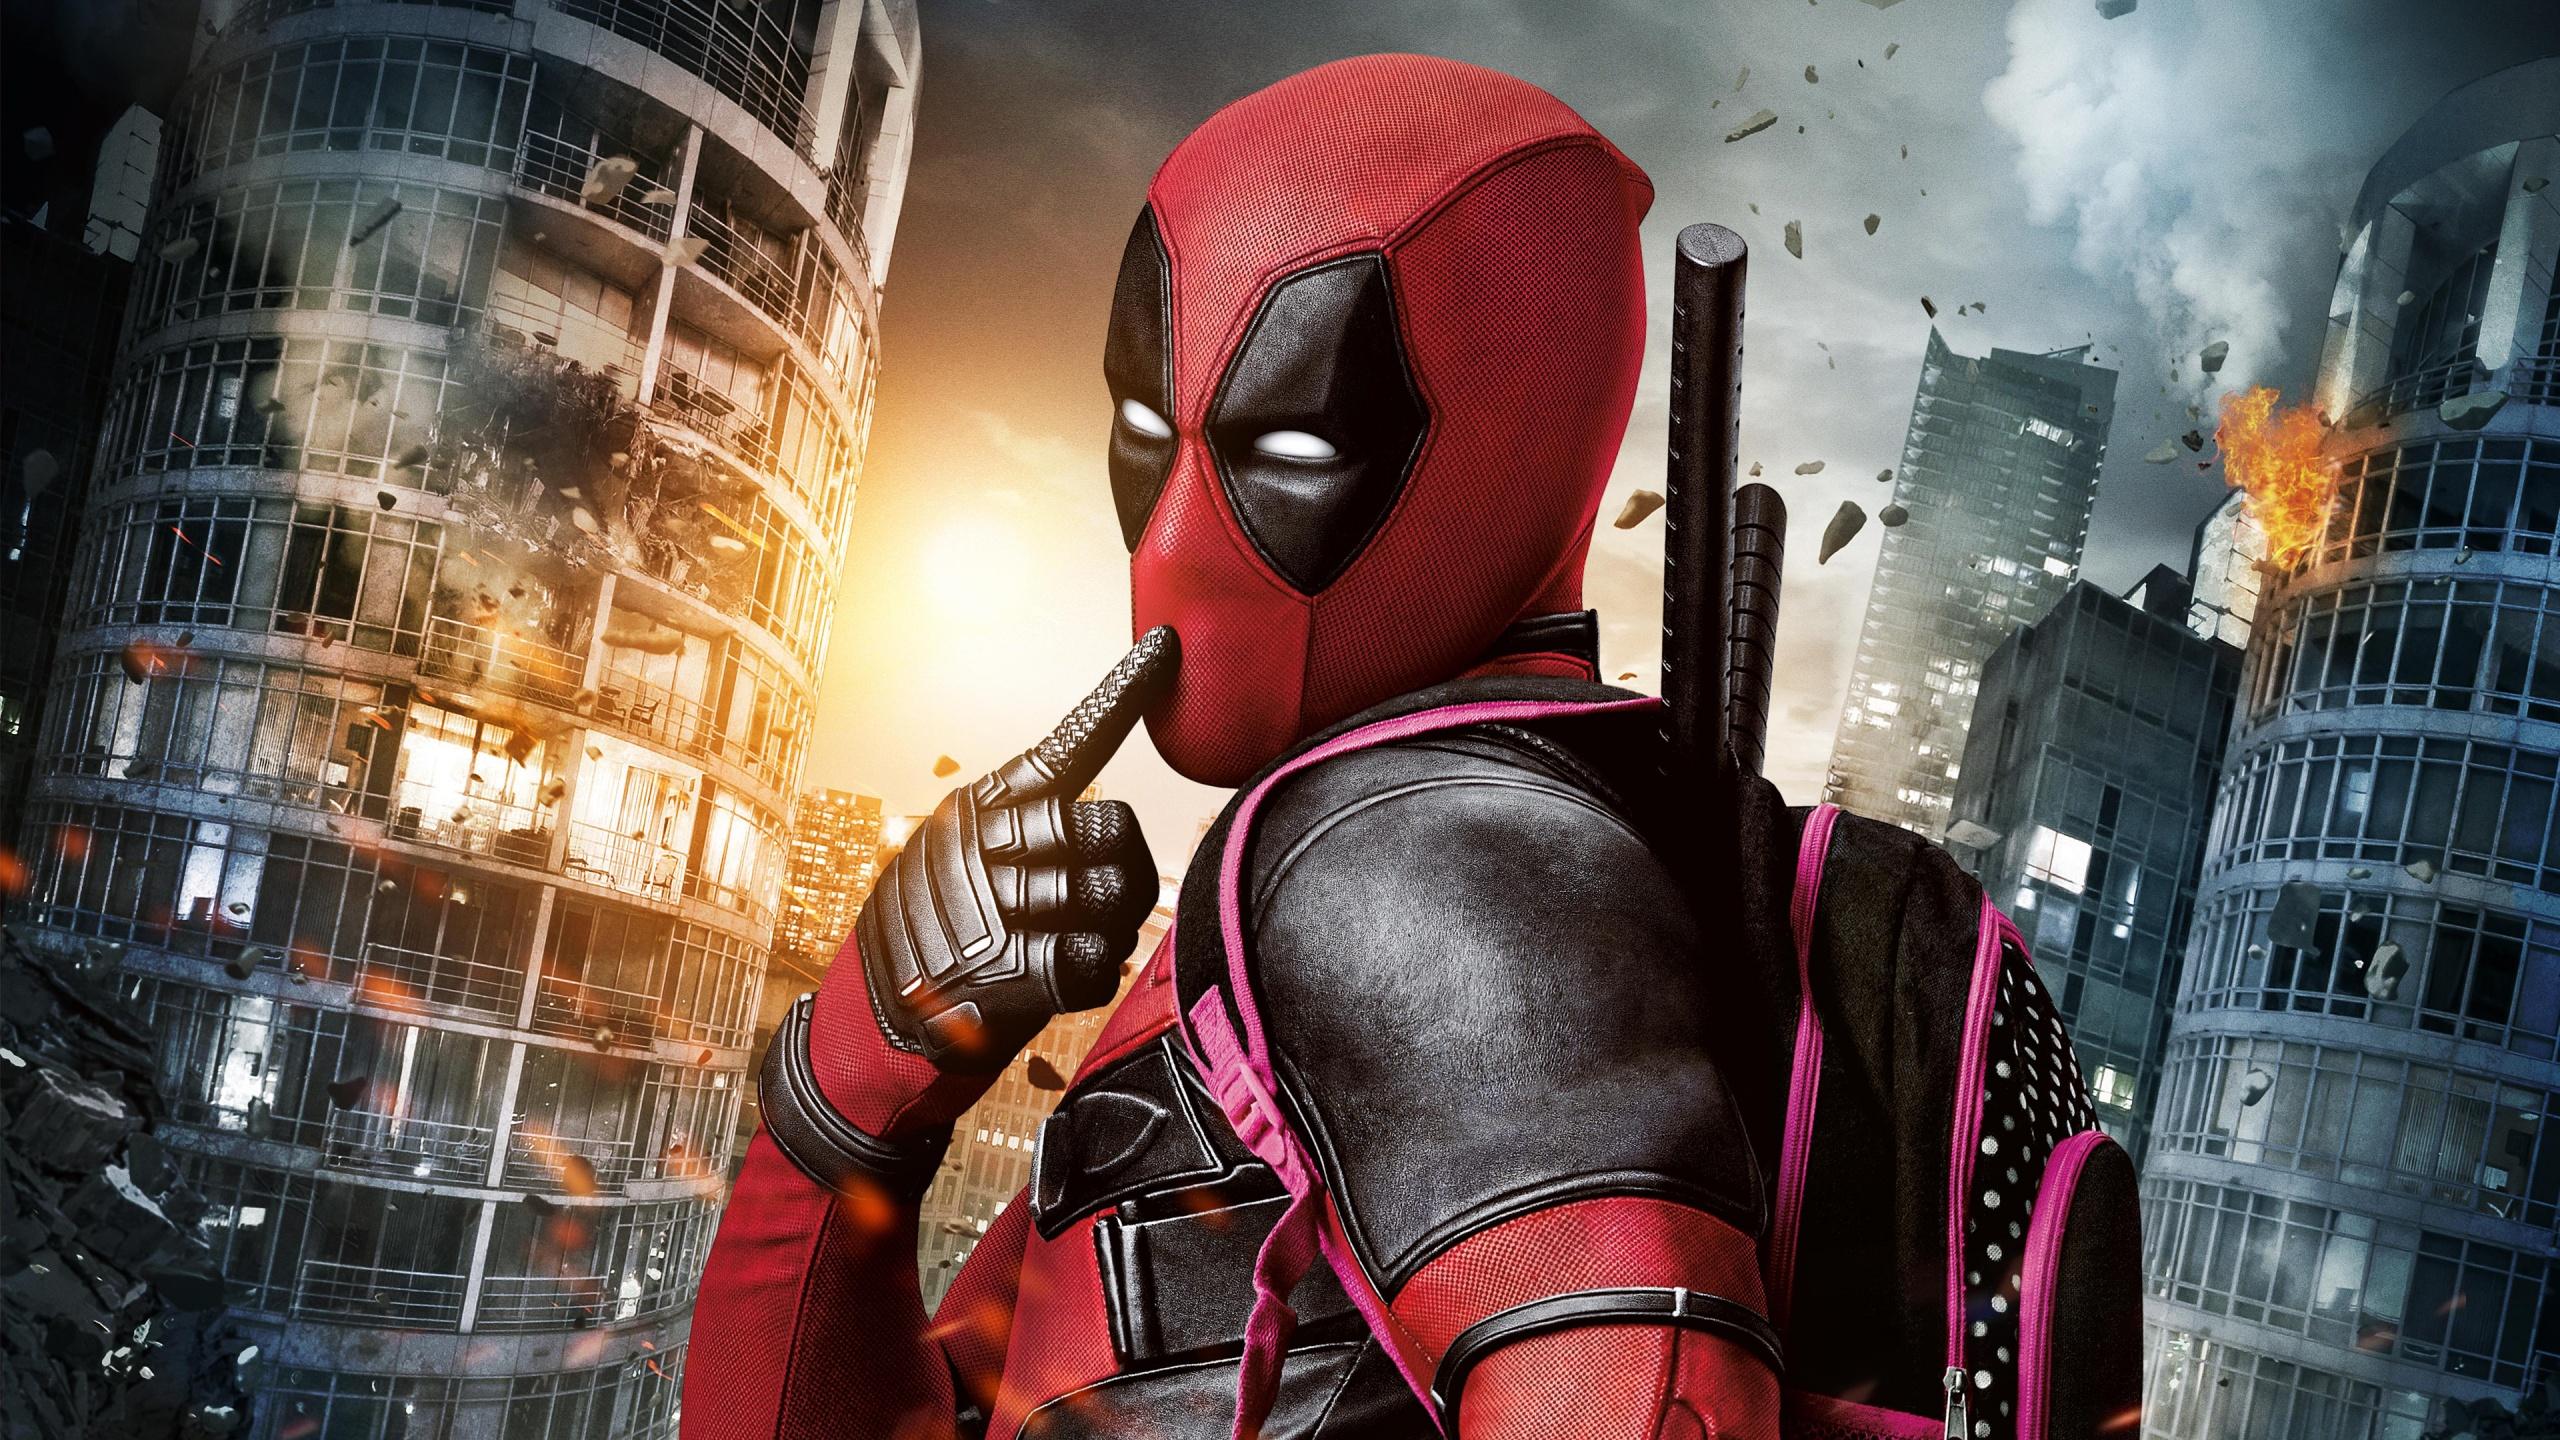 Marvel Deadpool Movie Wallpapers HD Wallpapers 2560x1440